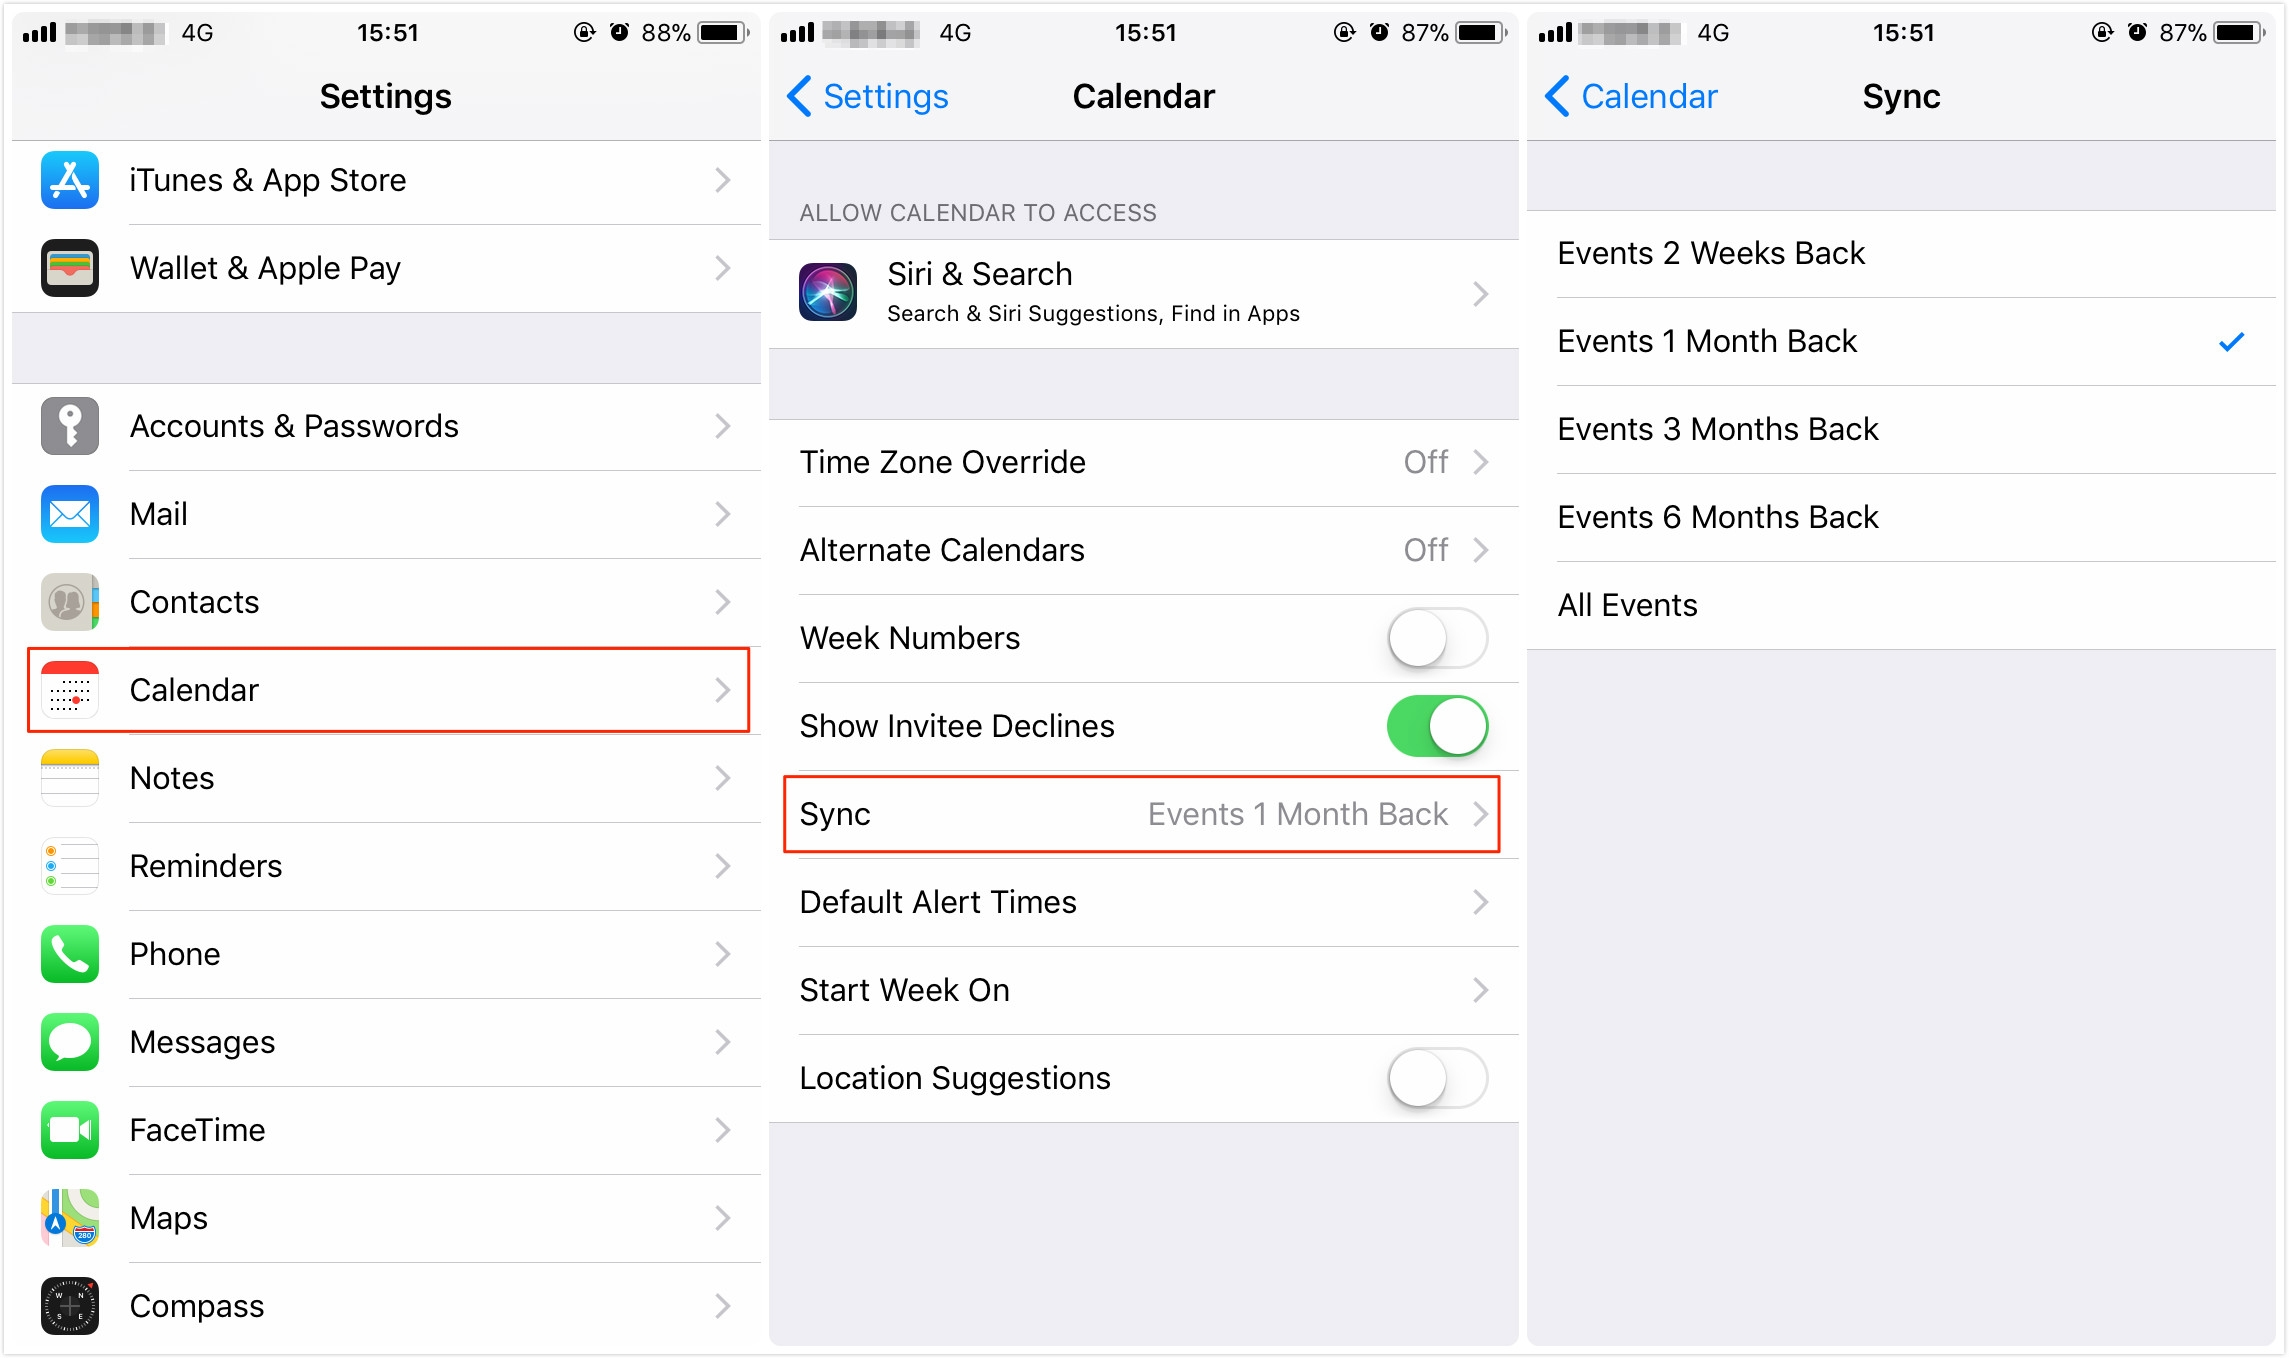 How To Fix: Iphone X/8/7/6 Calendar Problems [Ios 10/11]